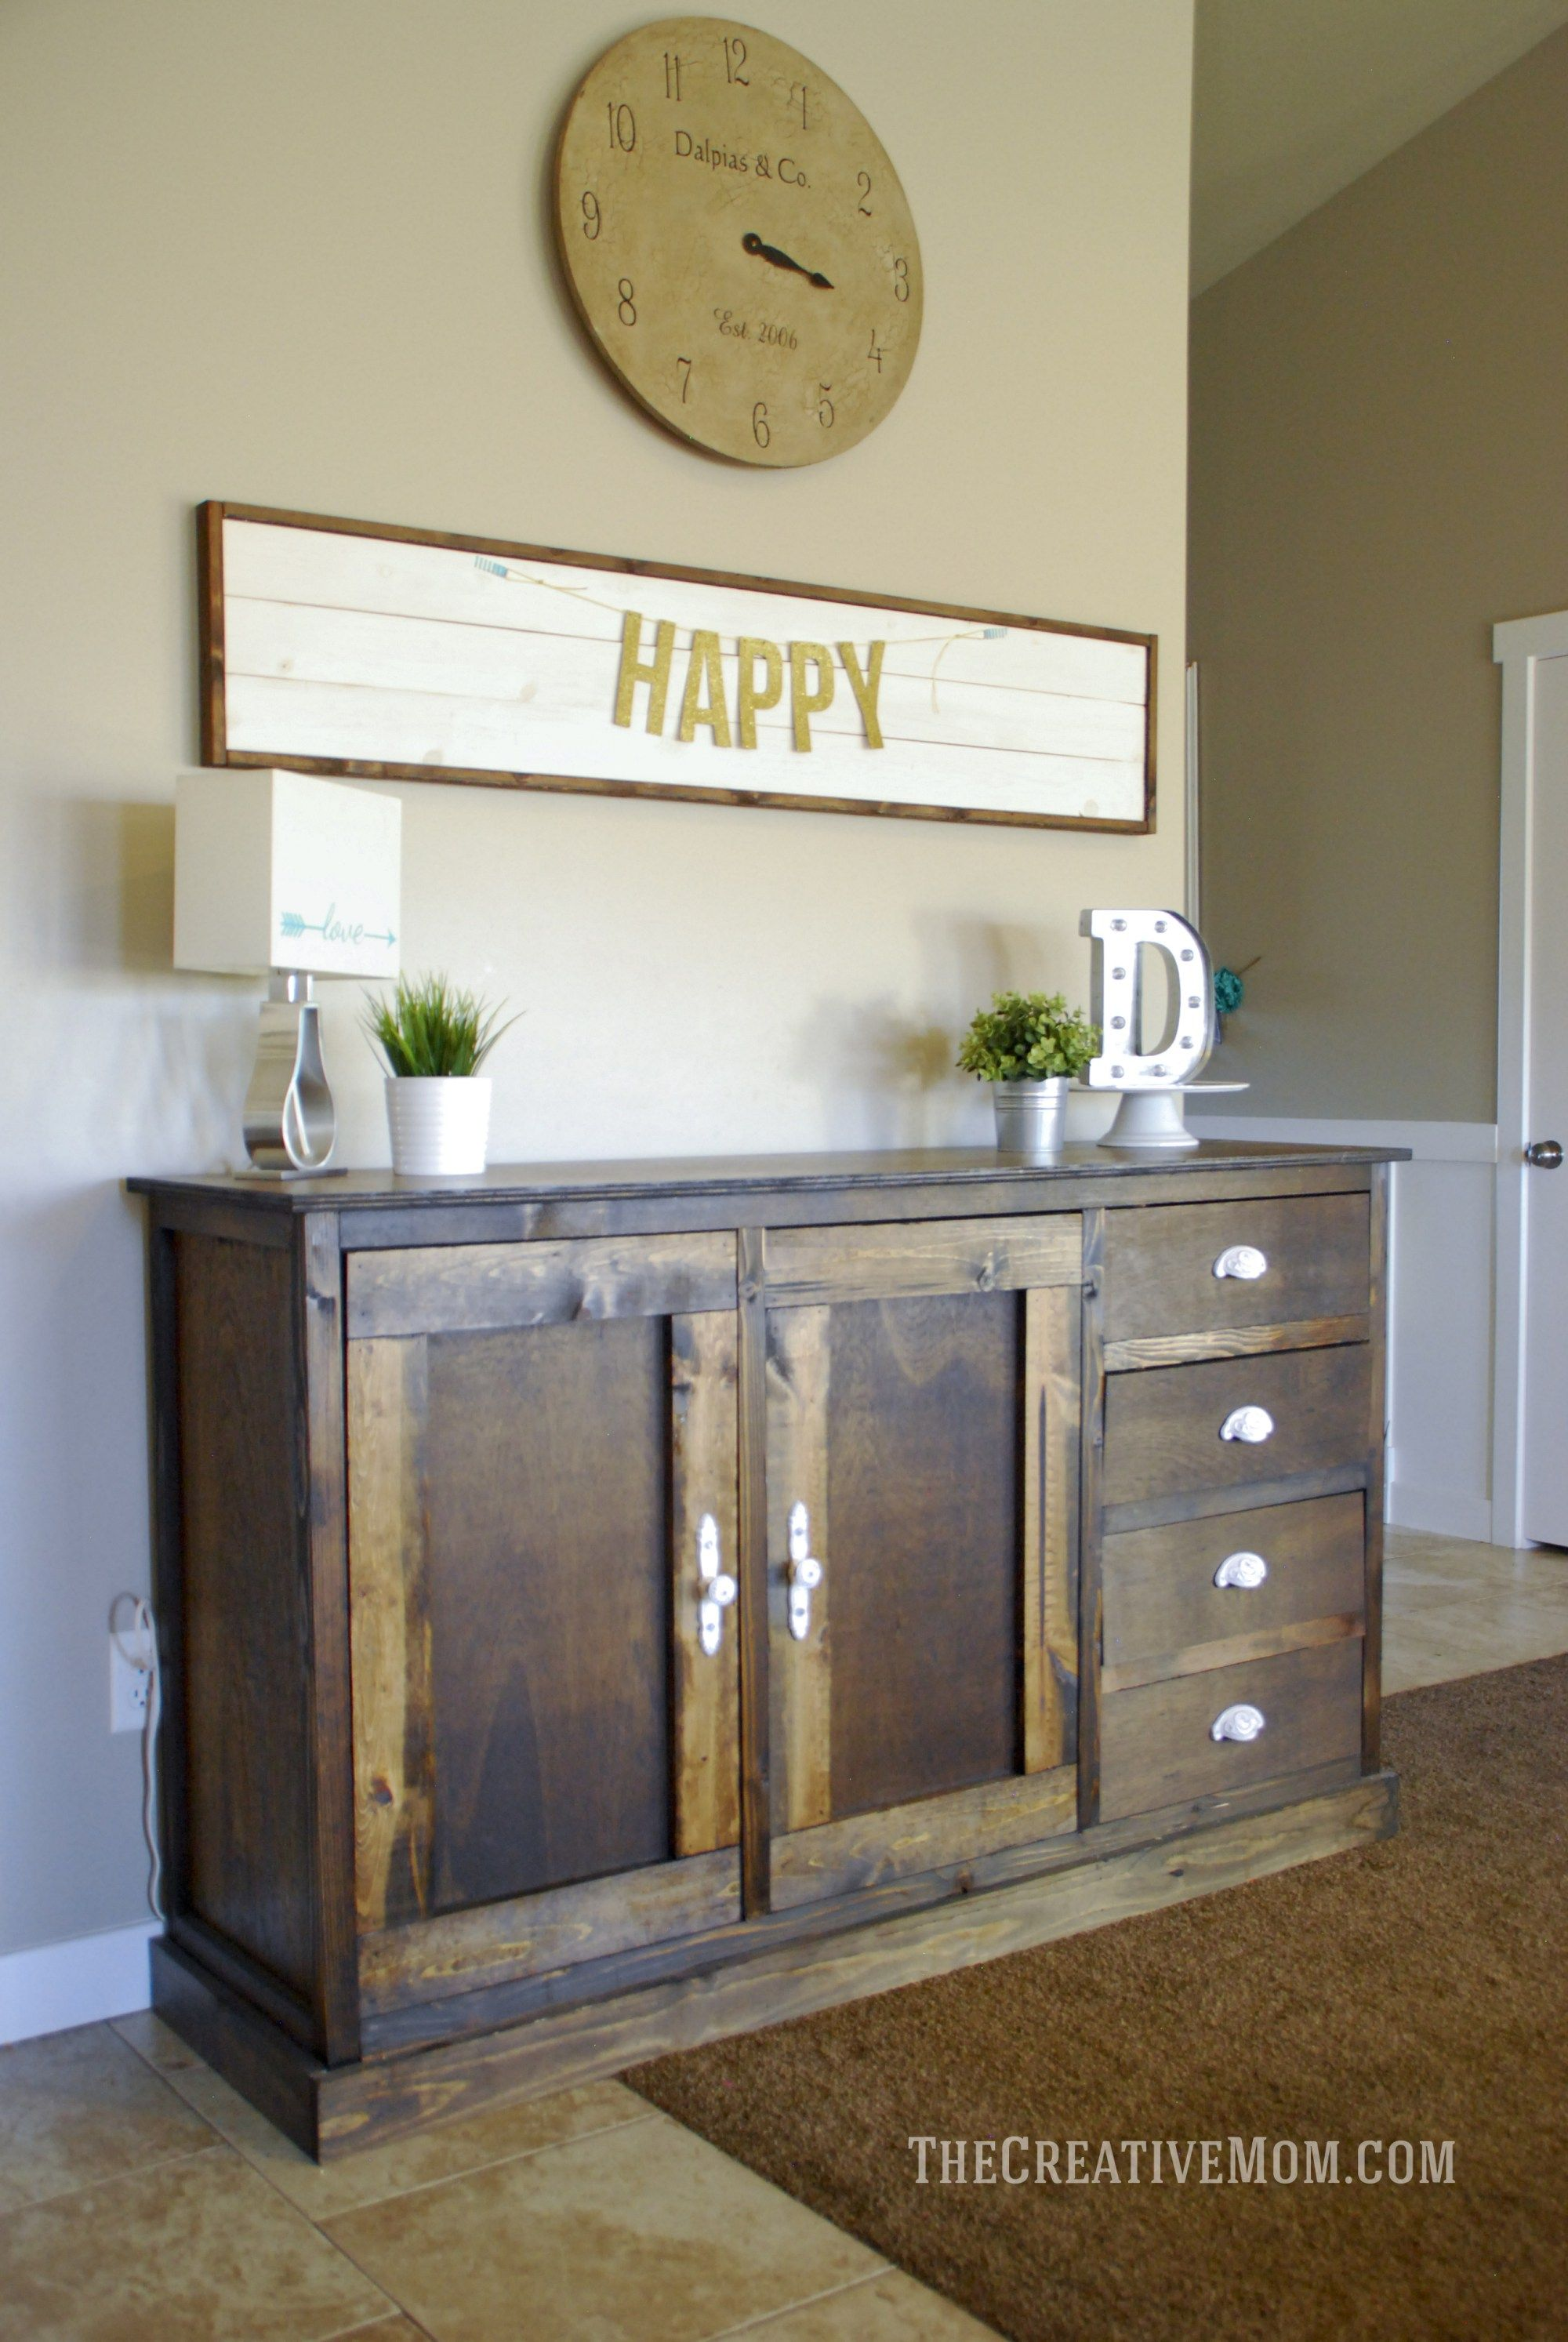 Diy farmhouse coffee table ikea hack rustic furniture